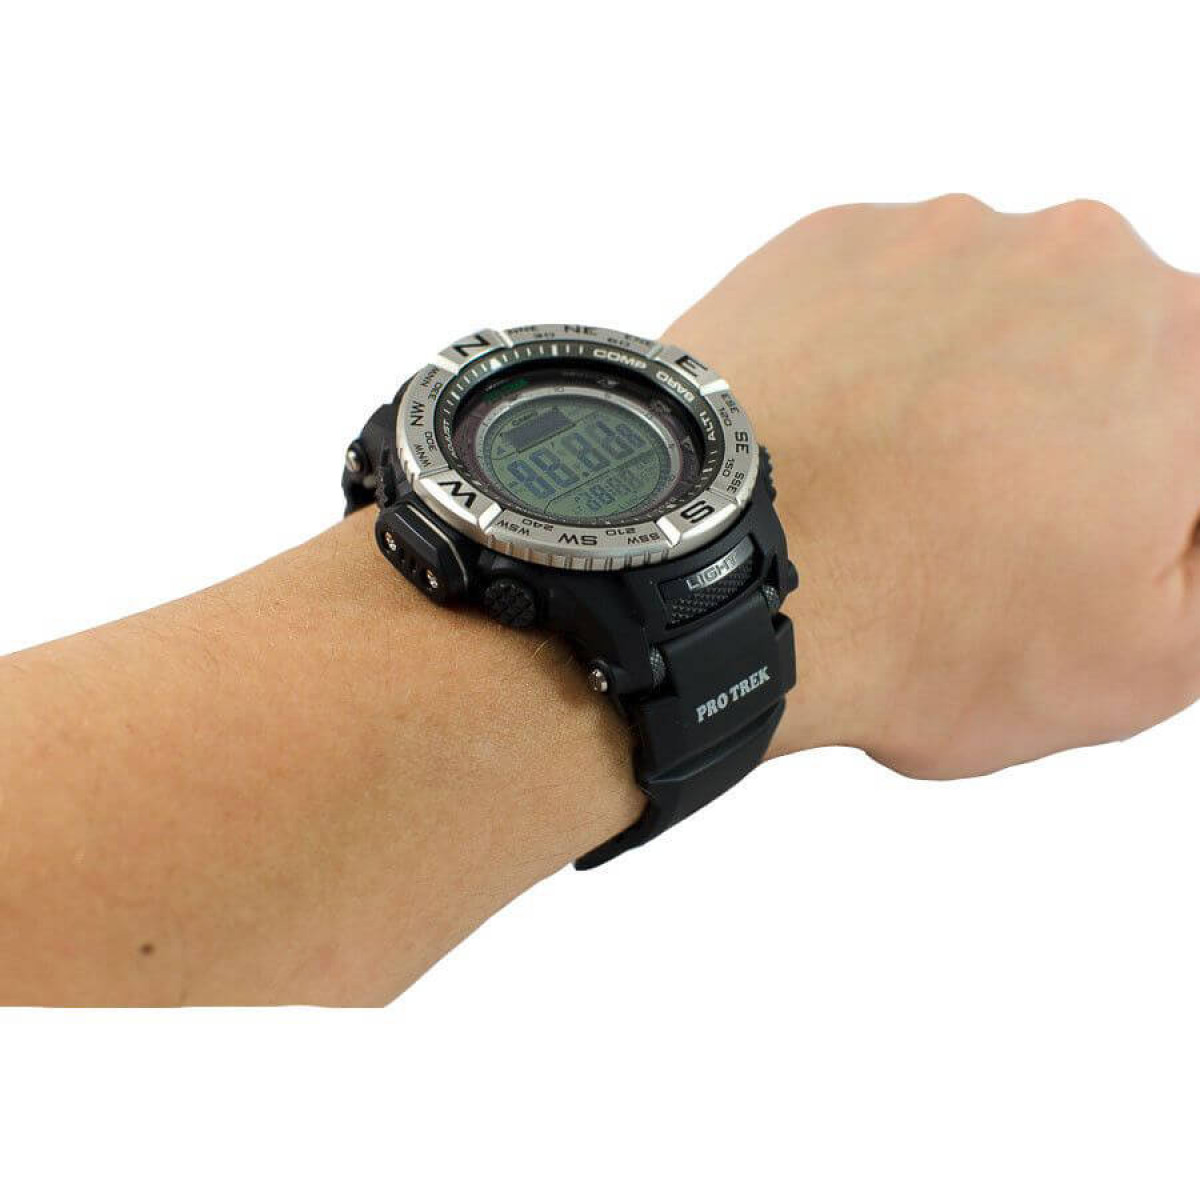 Часовник Casio Pro Trek PRW-3500-1ER